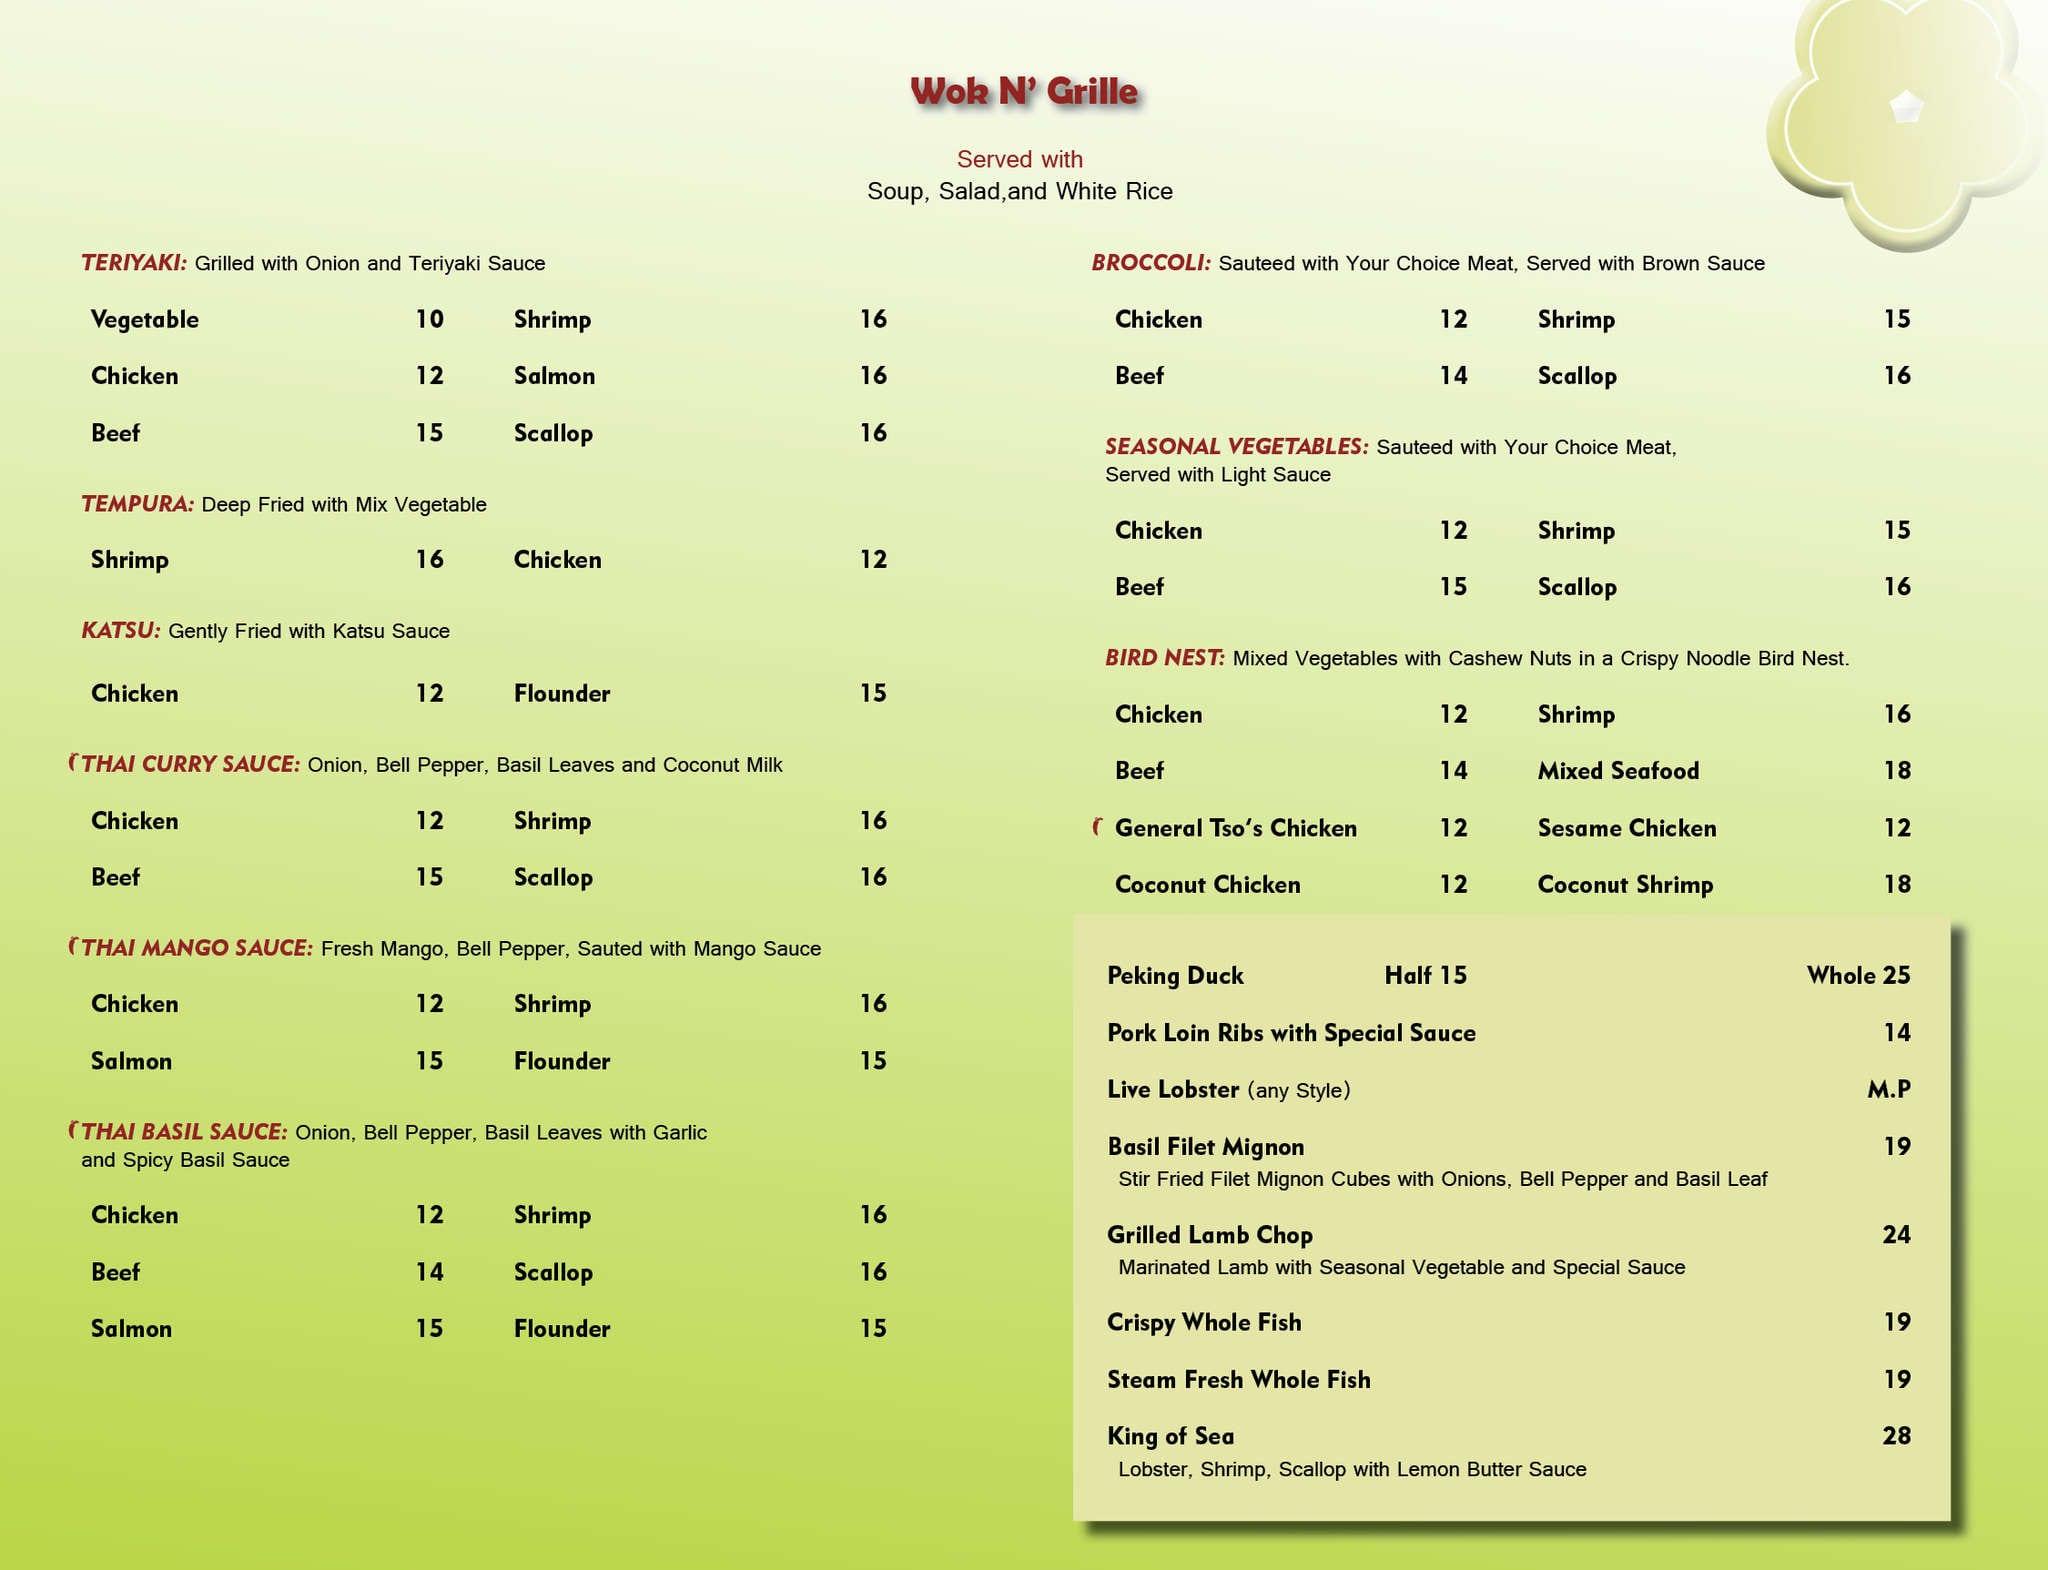 tokyo hibachi asian cuisine sushi buffet menu urbanspoon zomato rh zomato com tokyo buffet menu price tokyo one buffet menu